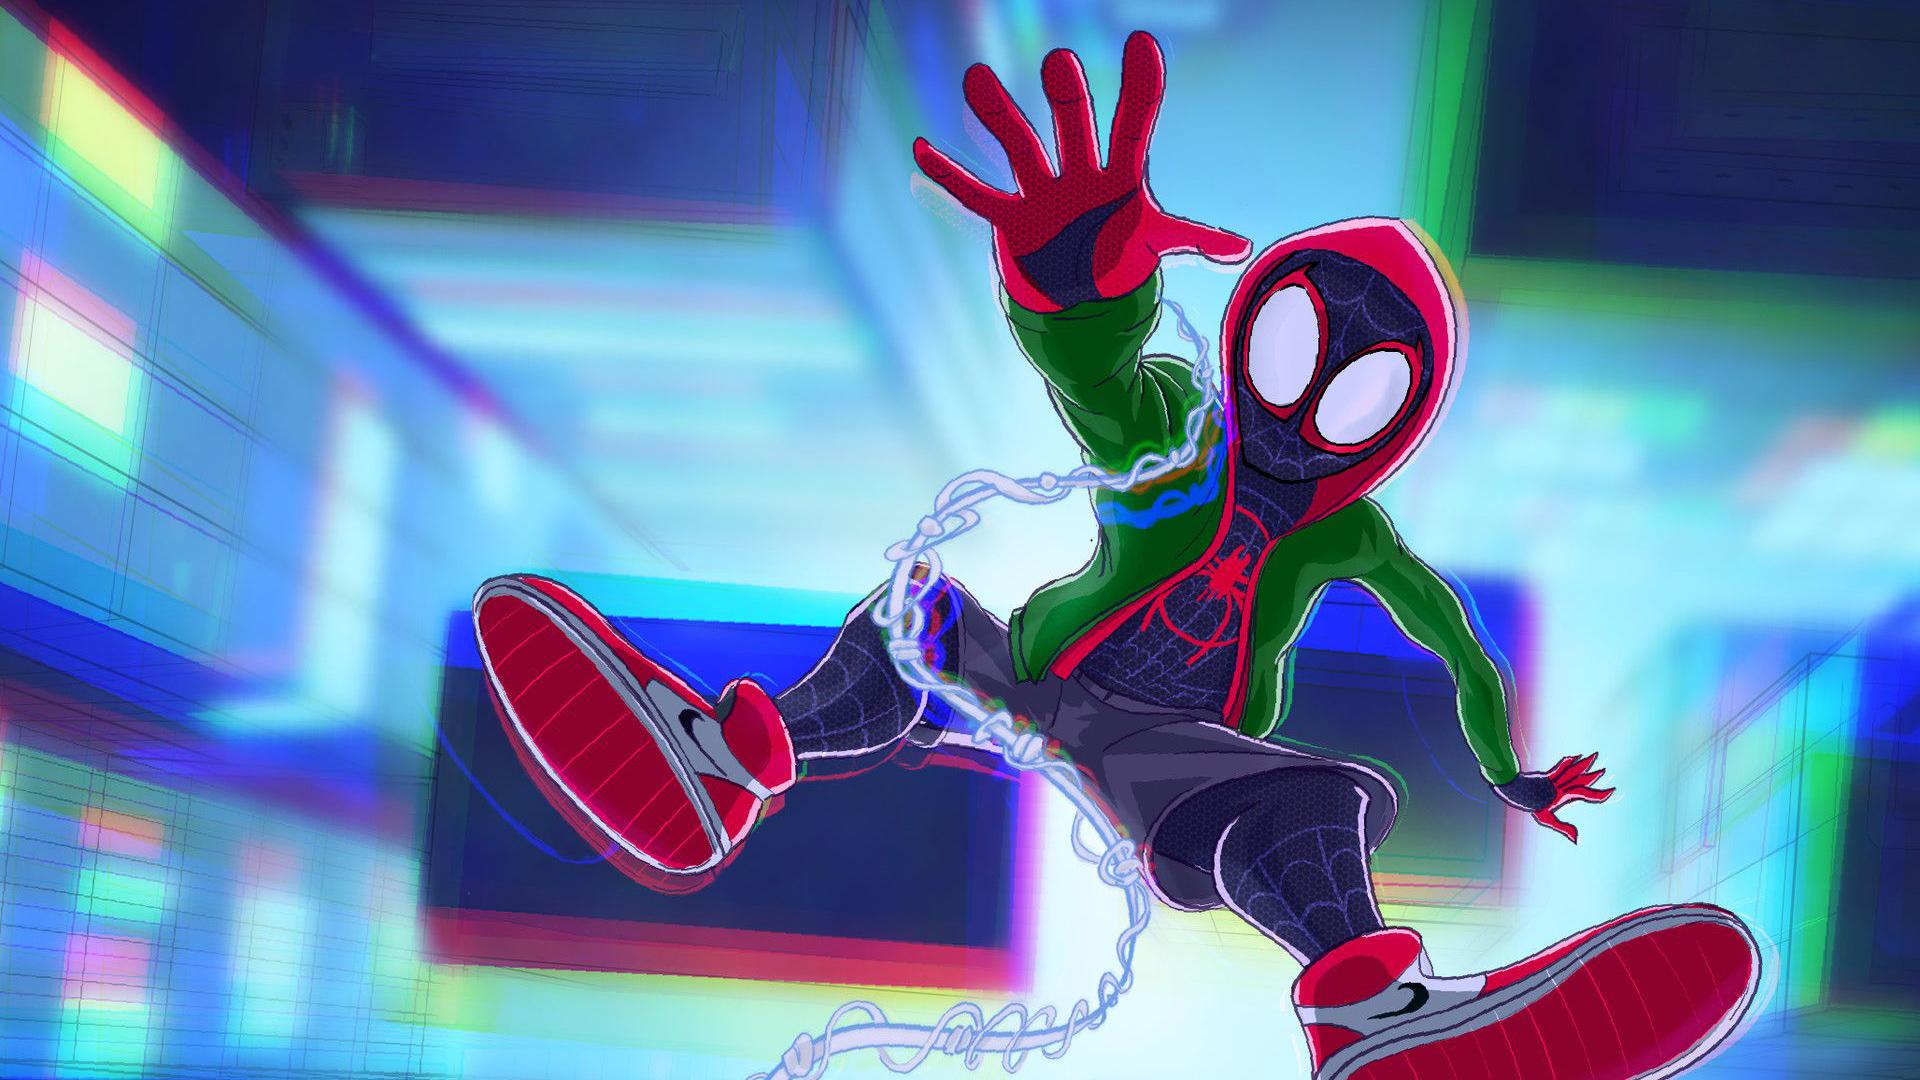 Spiderman Into The Spider Verse Movie Artworks 2018 Hd